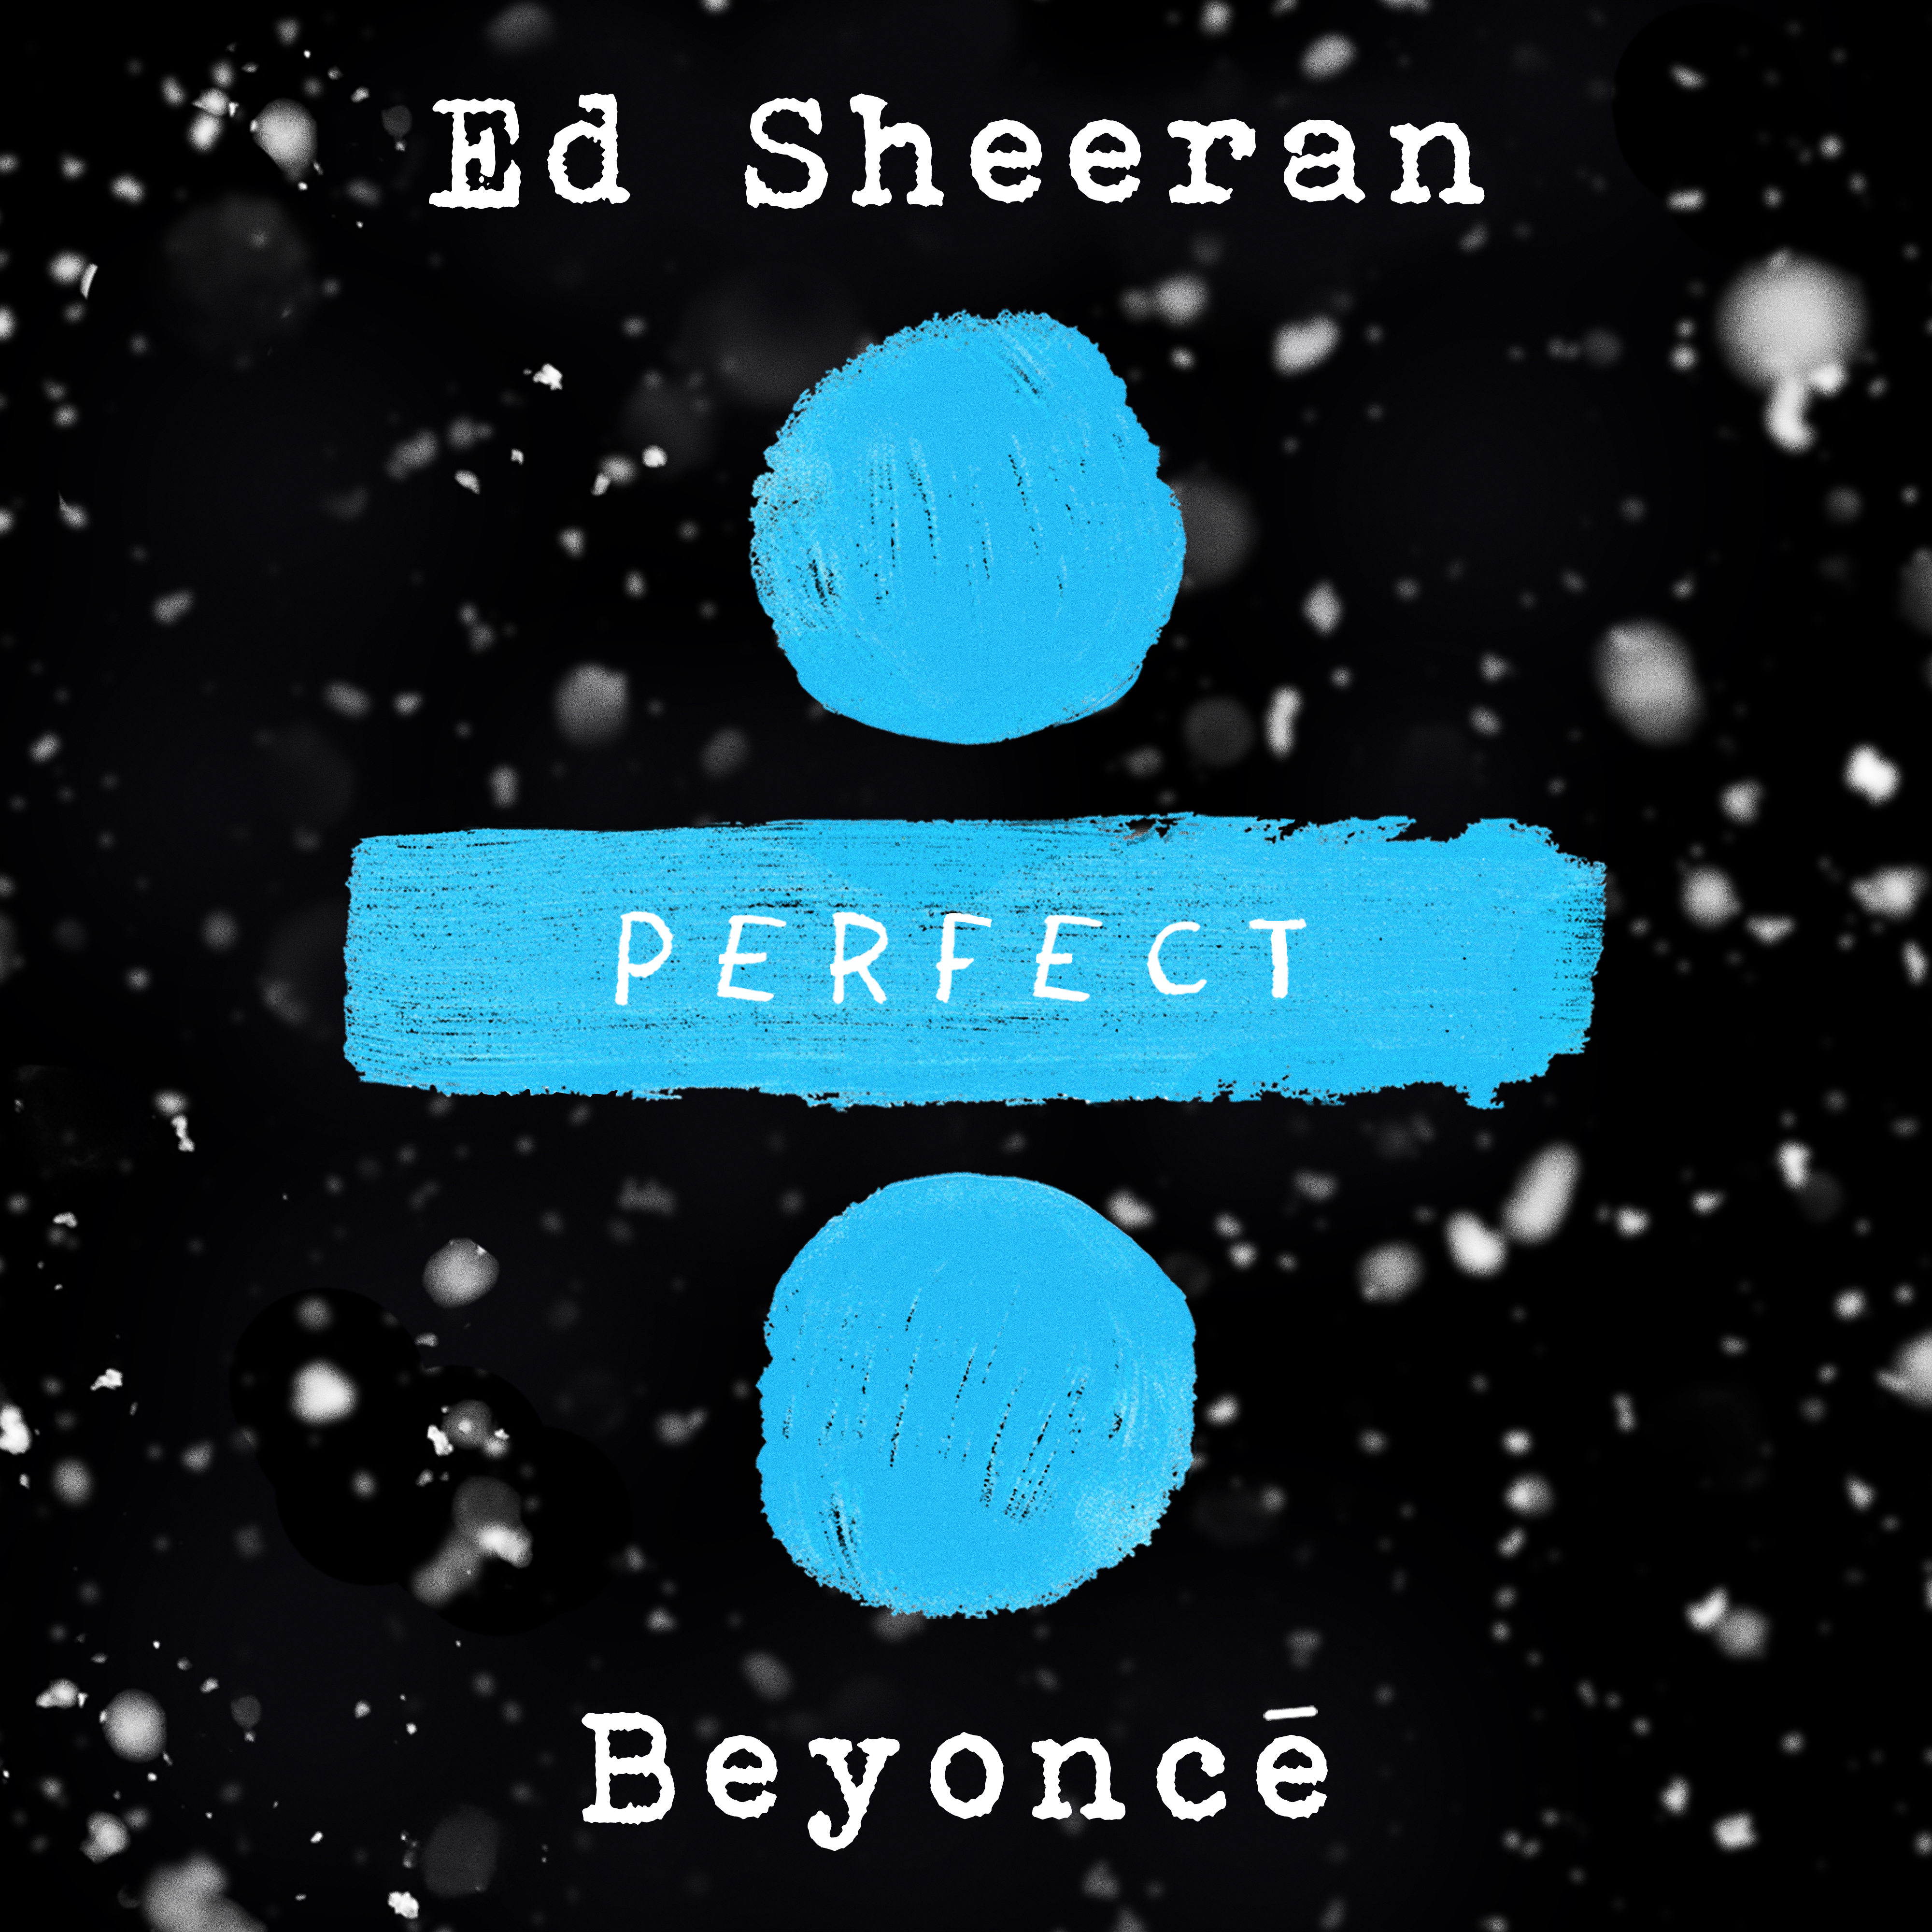 Ed Sheeran & Beyoncé's Perfect cover art